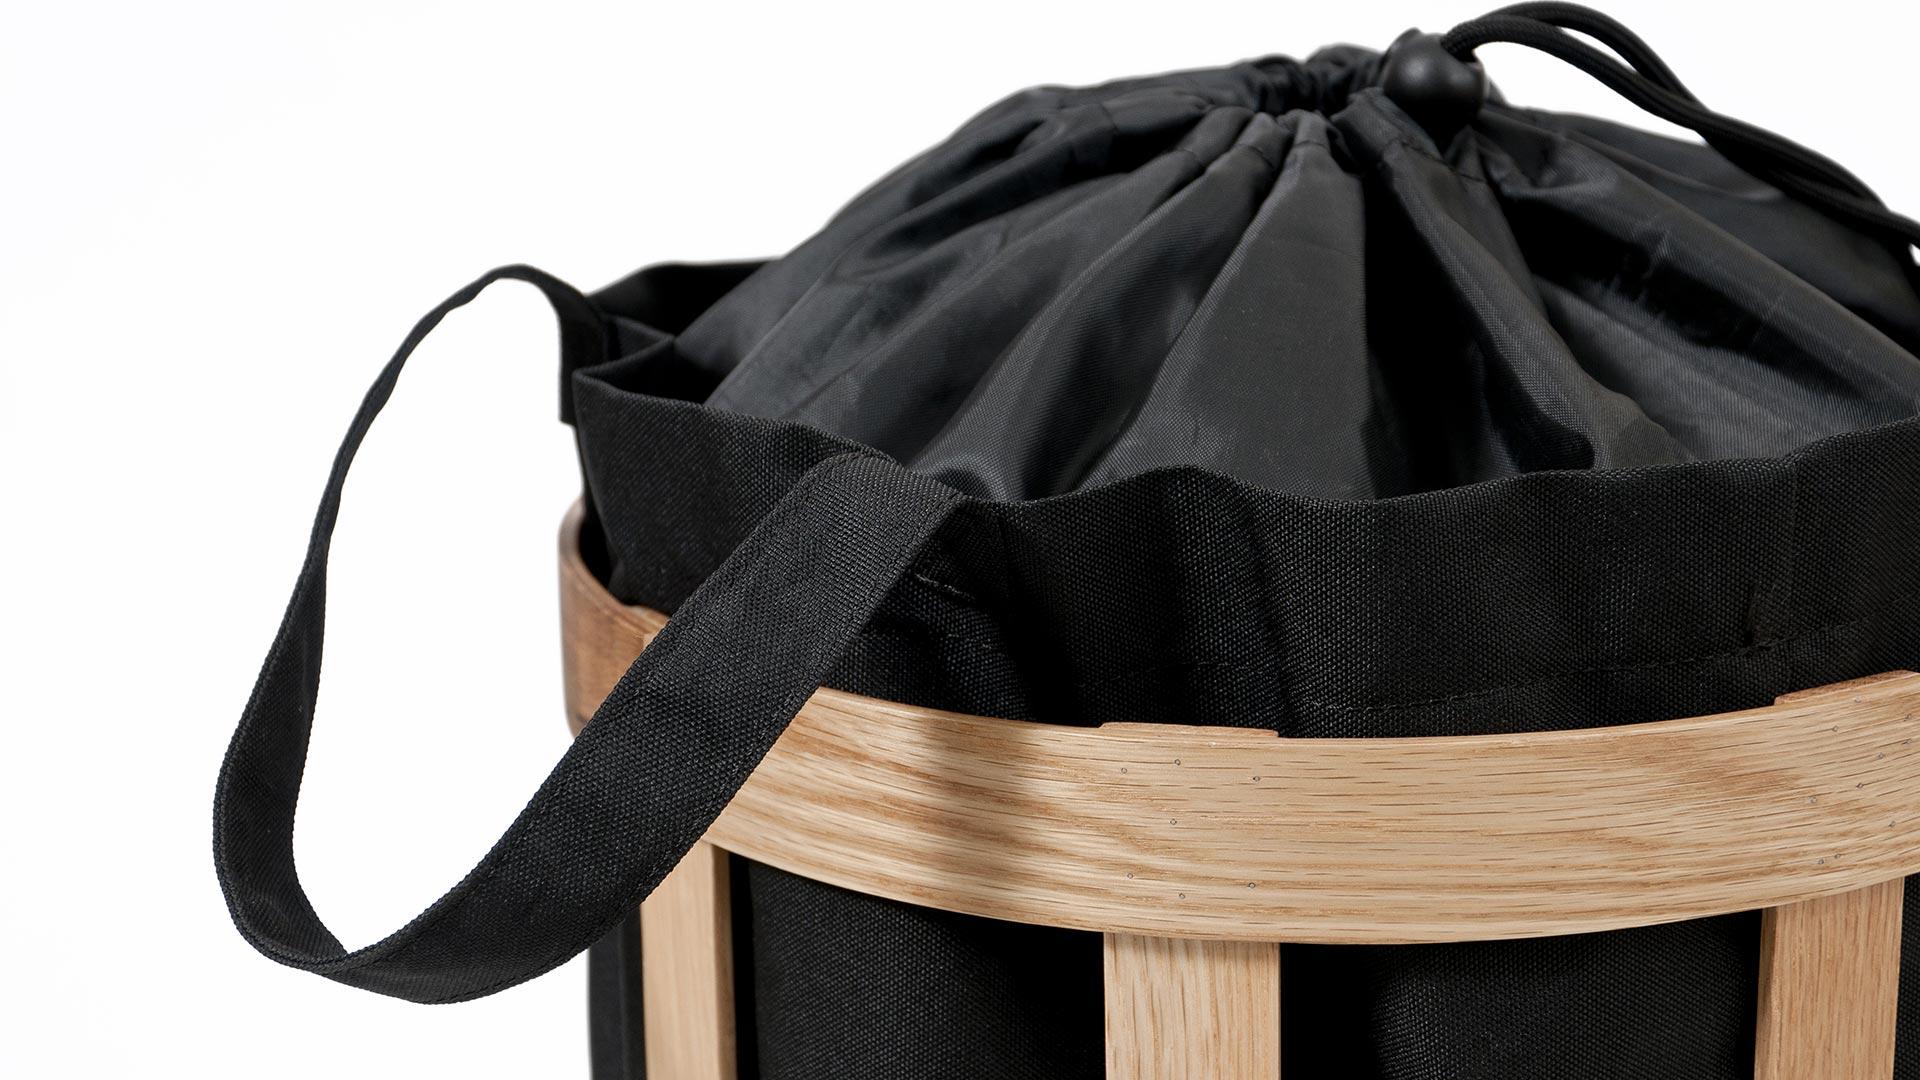 laundry-basket-black-cage-detail